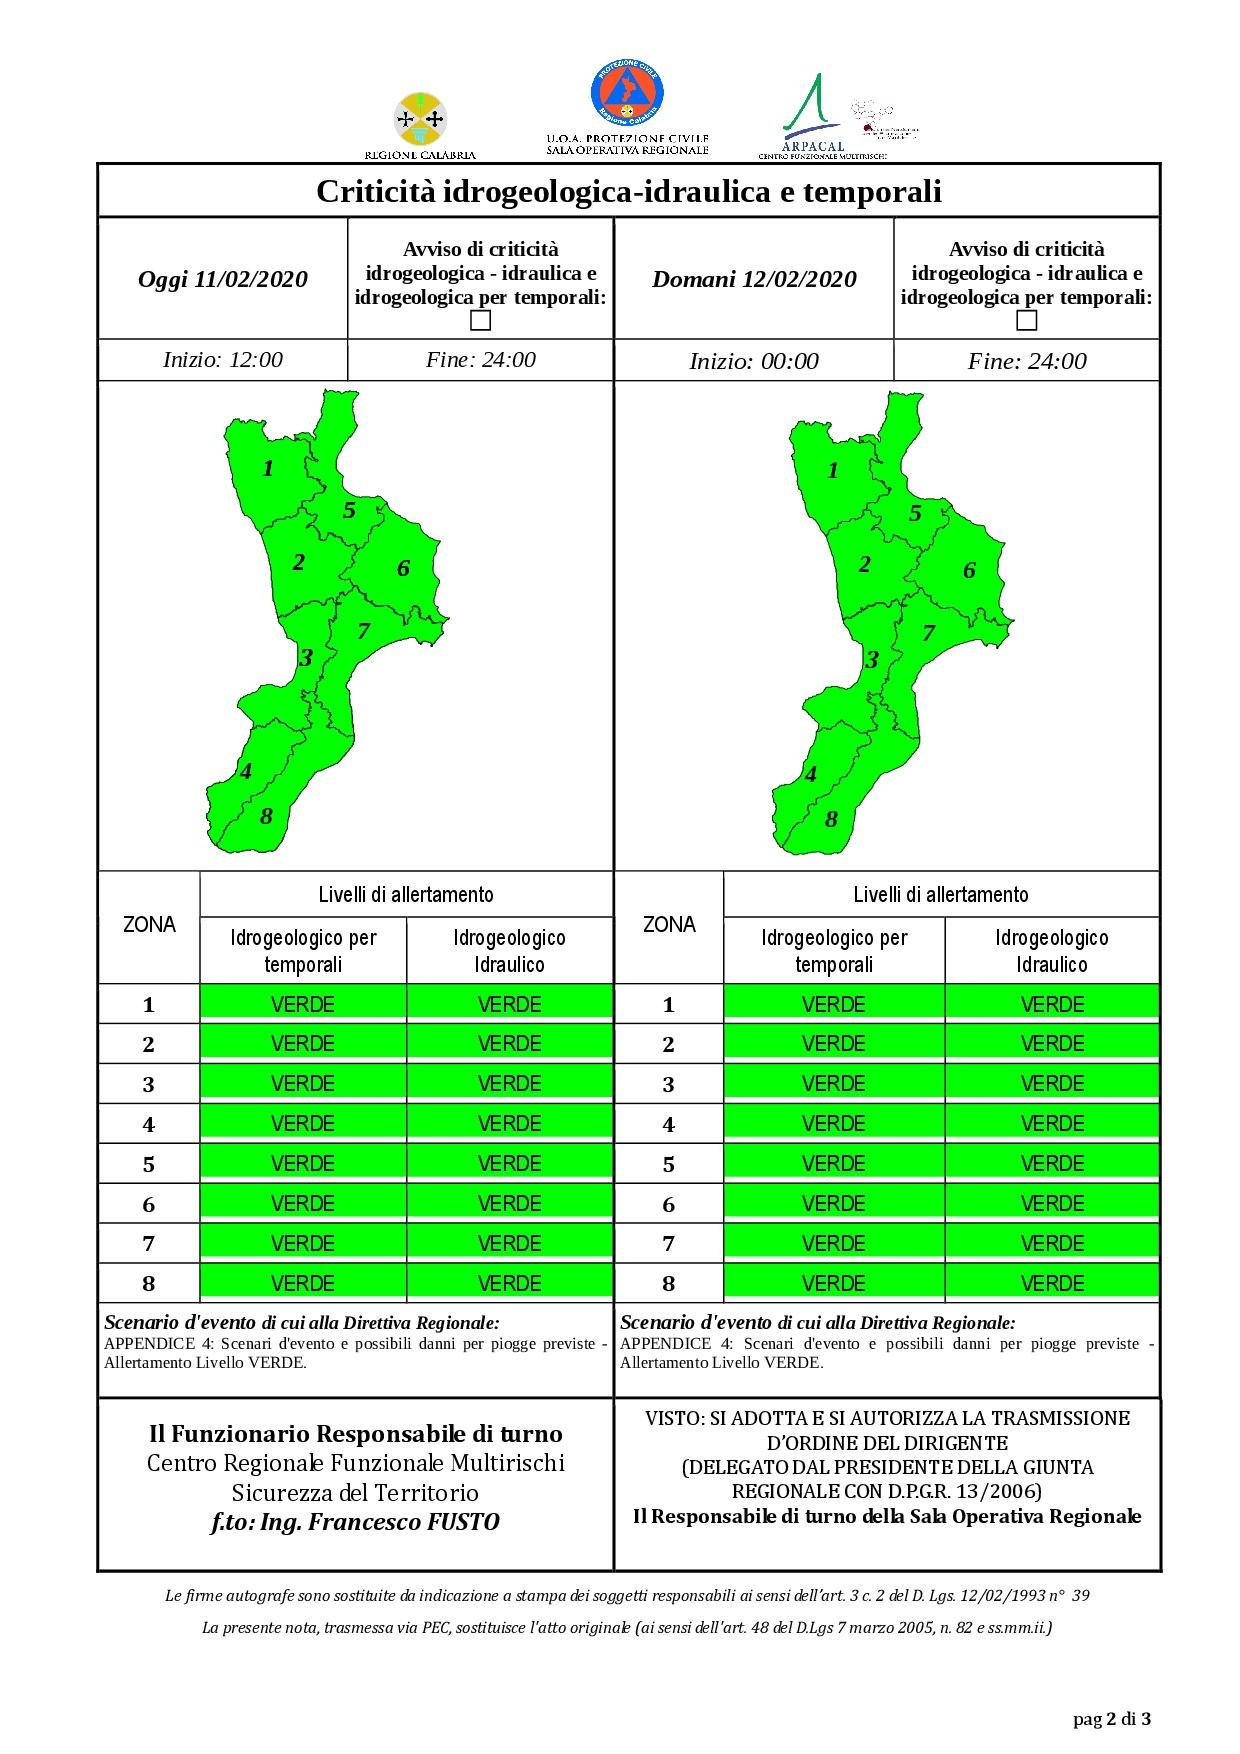 Criticità idrogeologica-idraulica e temporali in Calabria 11-02-2020